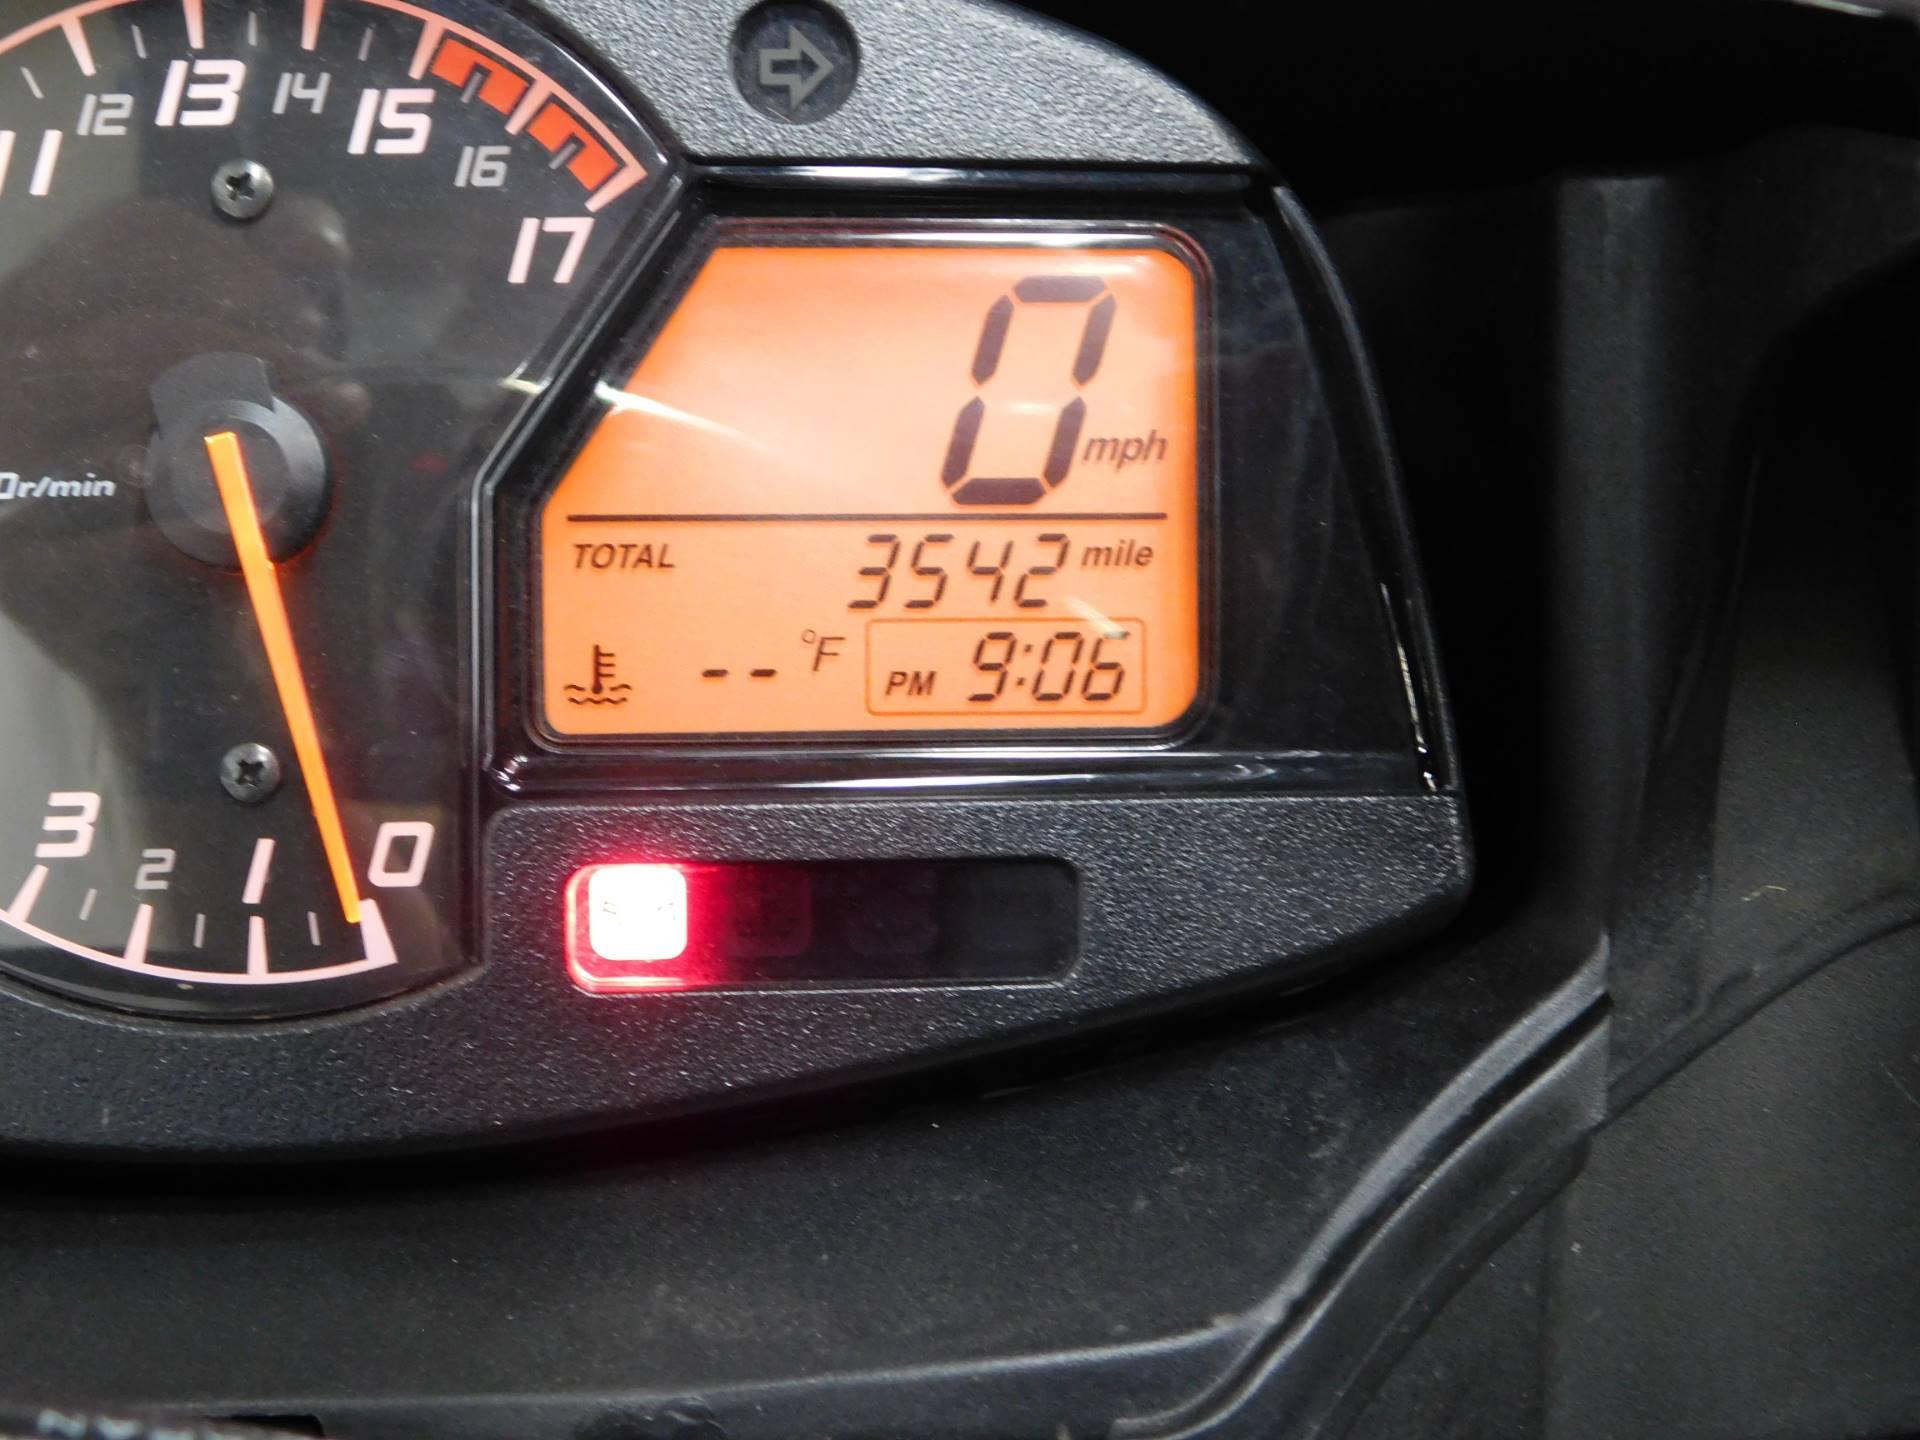 Used 2014 Honda Cbr600rr Motorcycles In Eden Prairie Mn Stock